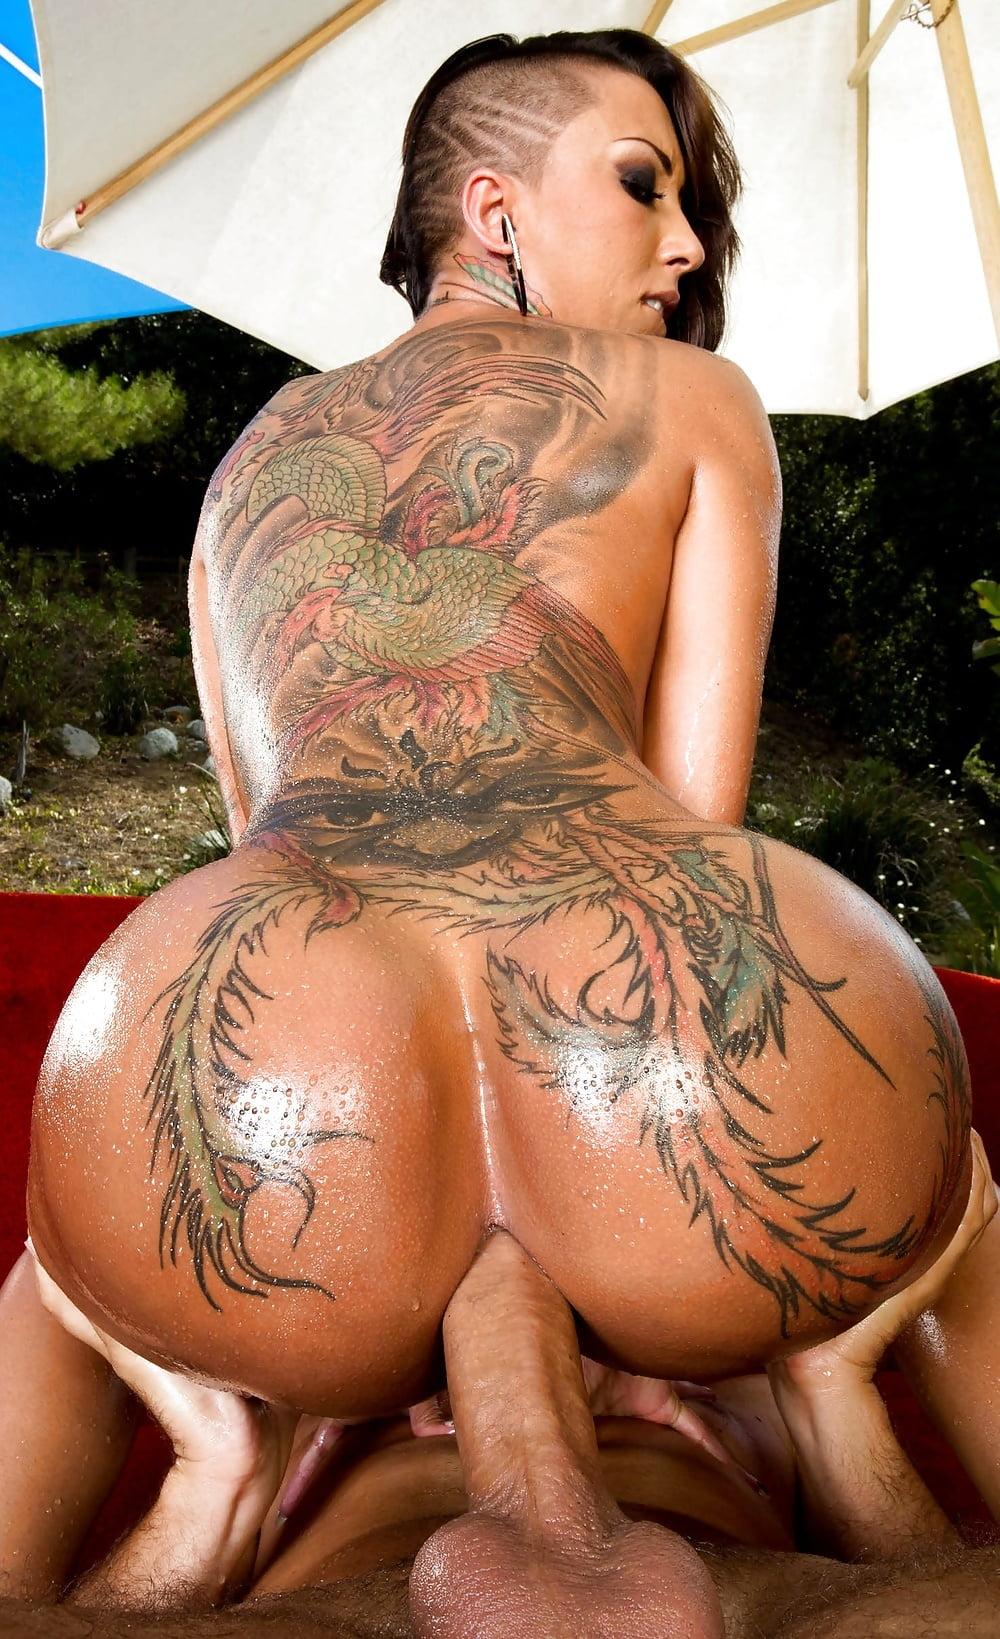 Chicks big nude tattooed ass, girl on girl sexs